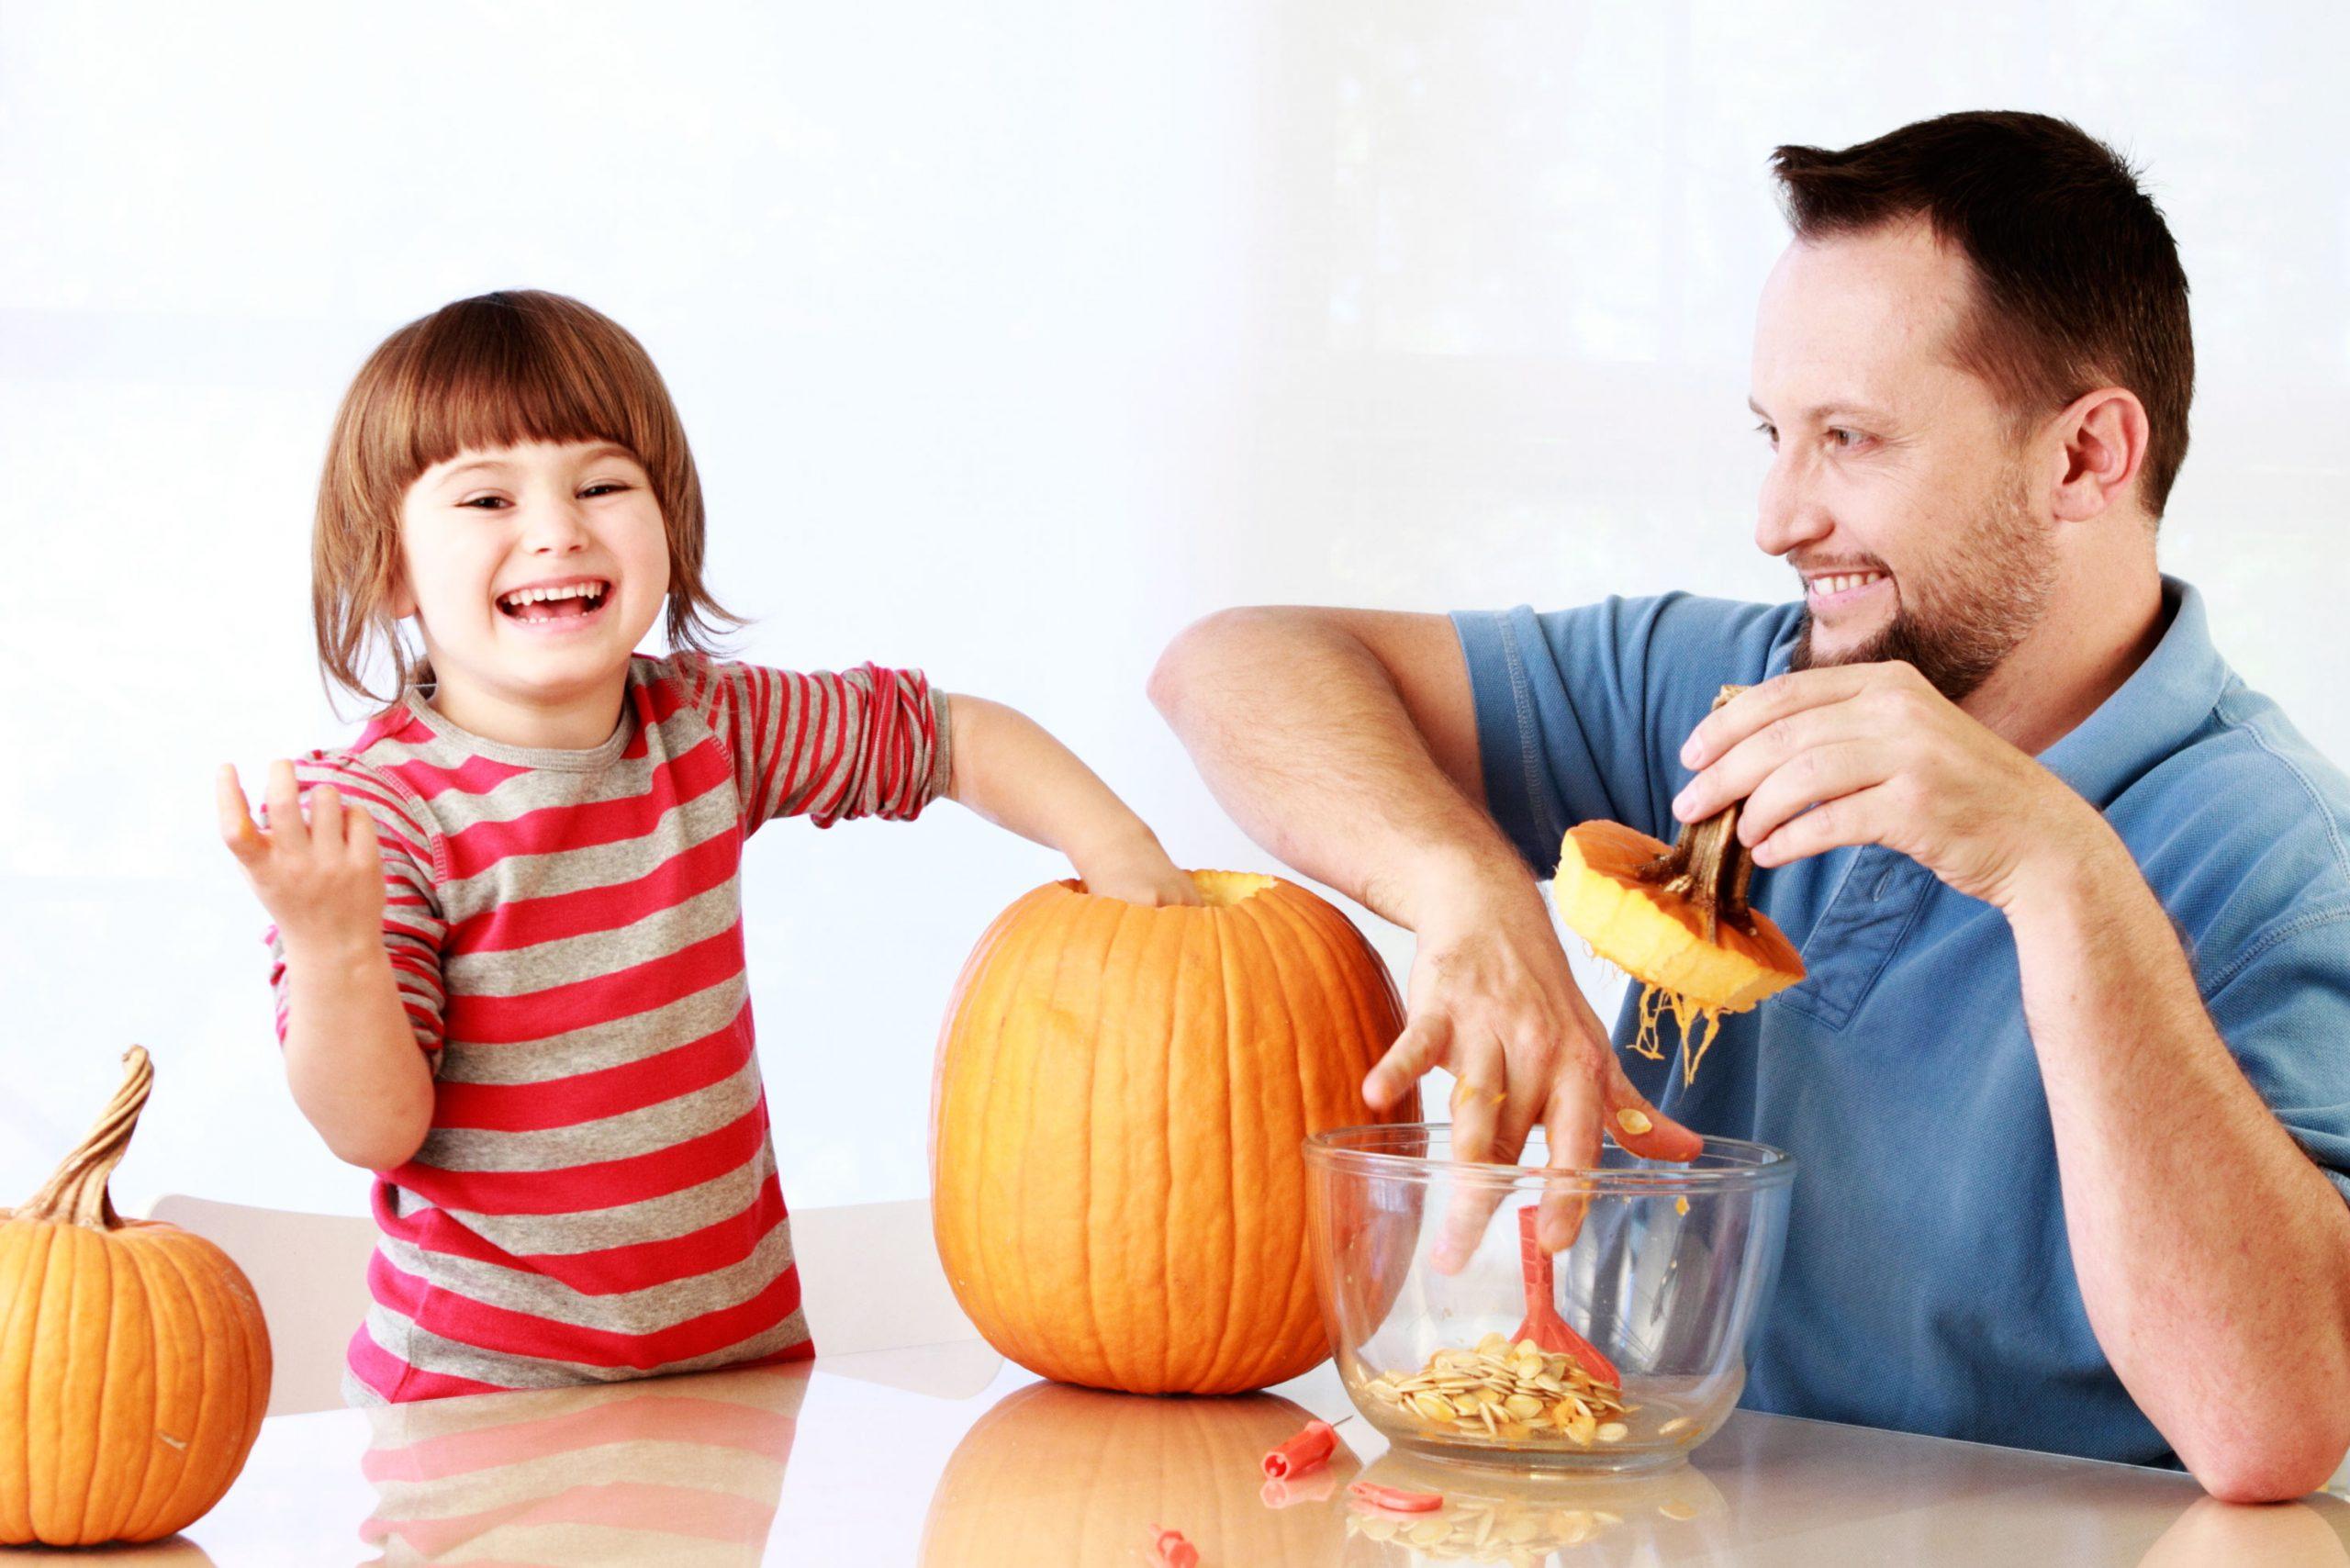 The Pumpkin Parable